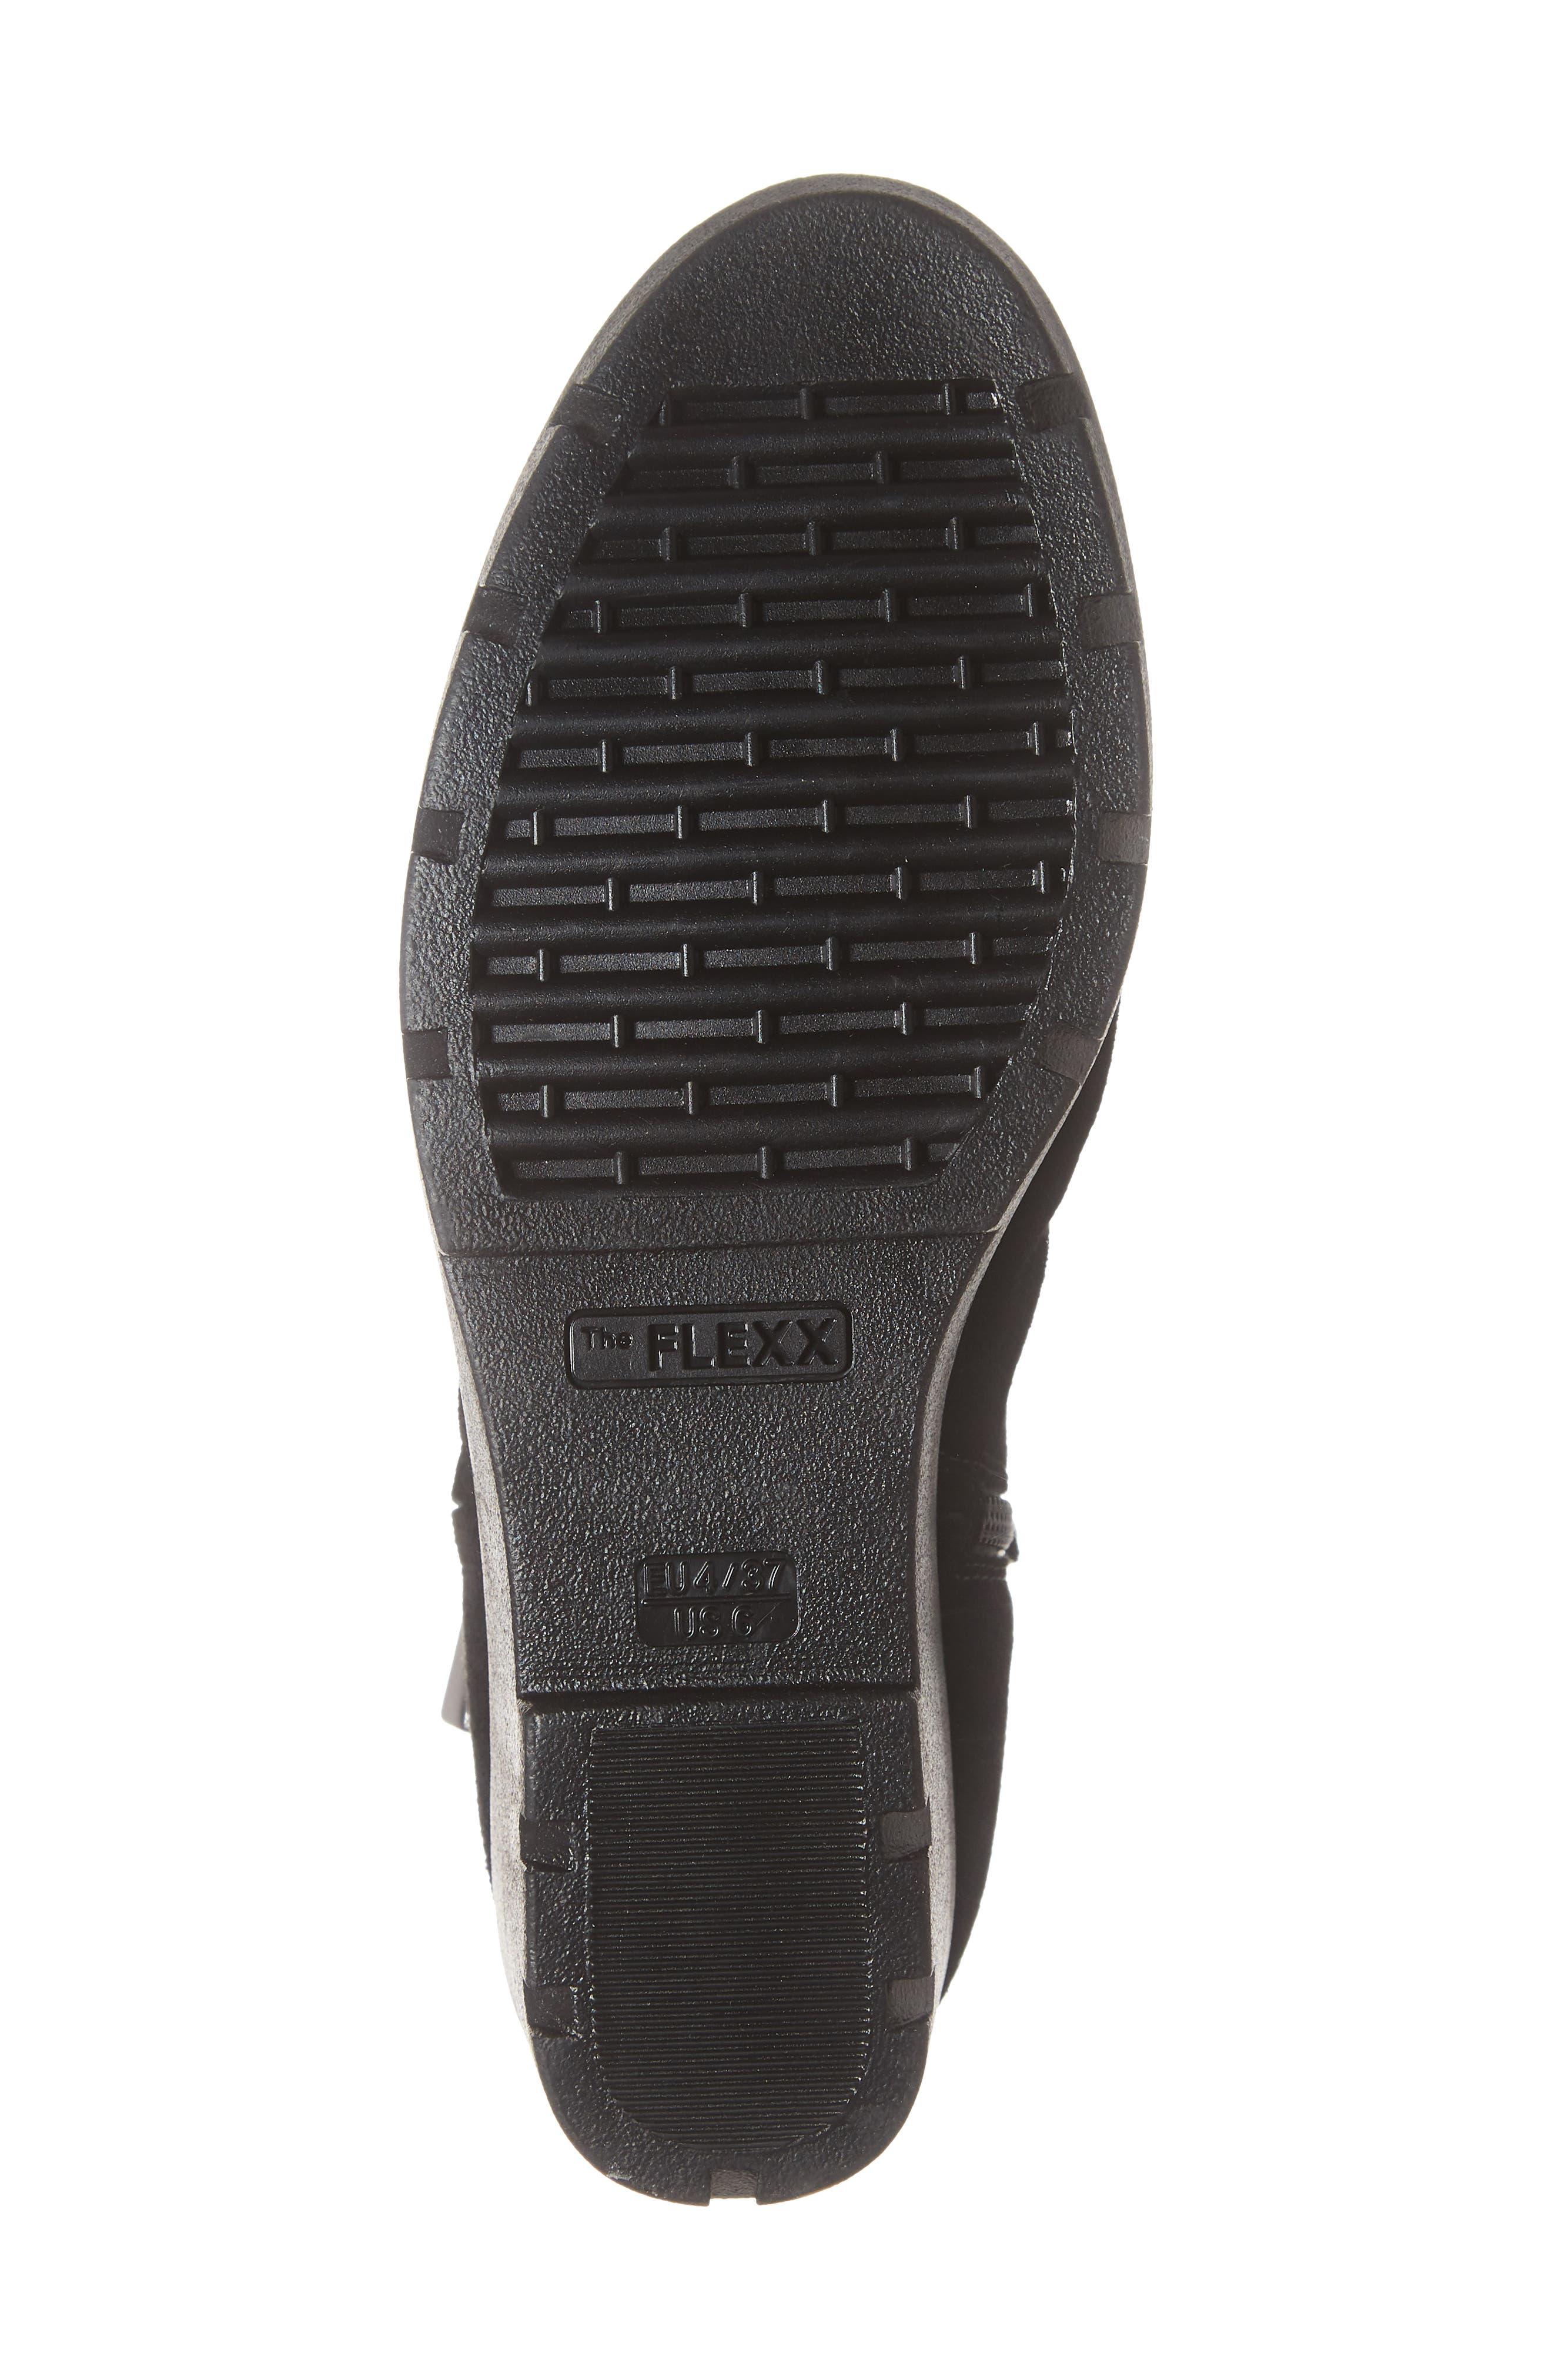 THE FLEXX, Slingshot Ankle Bootie, Alternate thumbnail 6, color, BLACK WATERPROOF SUEDE